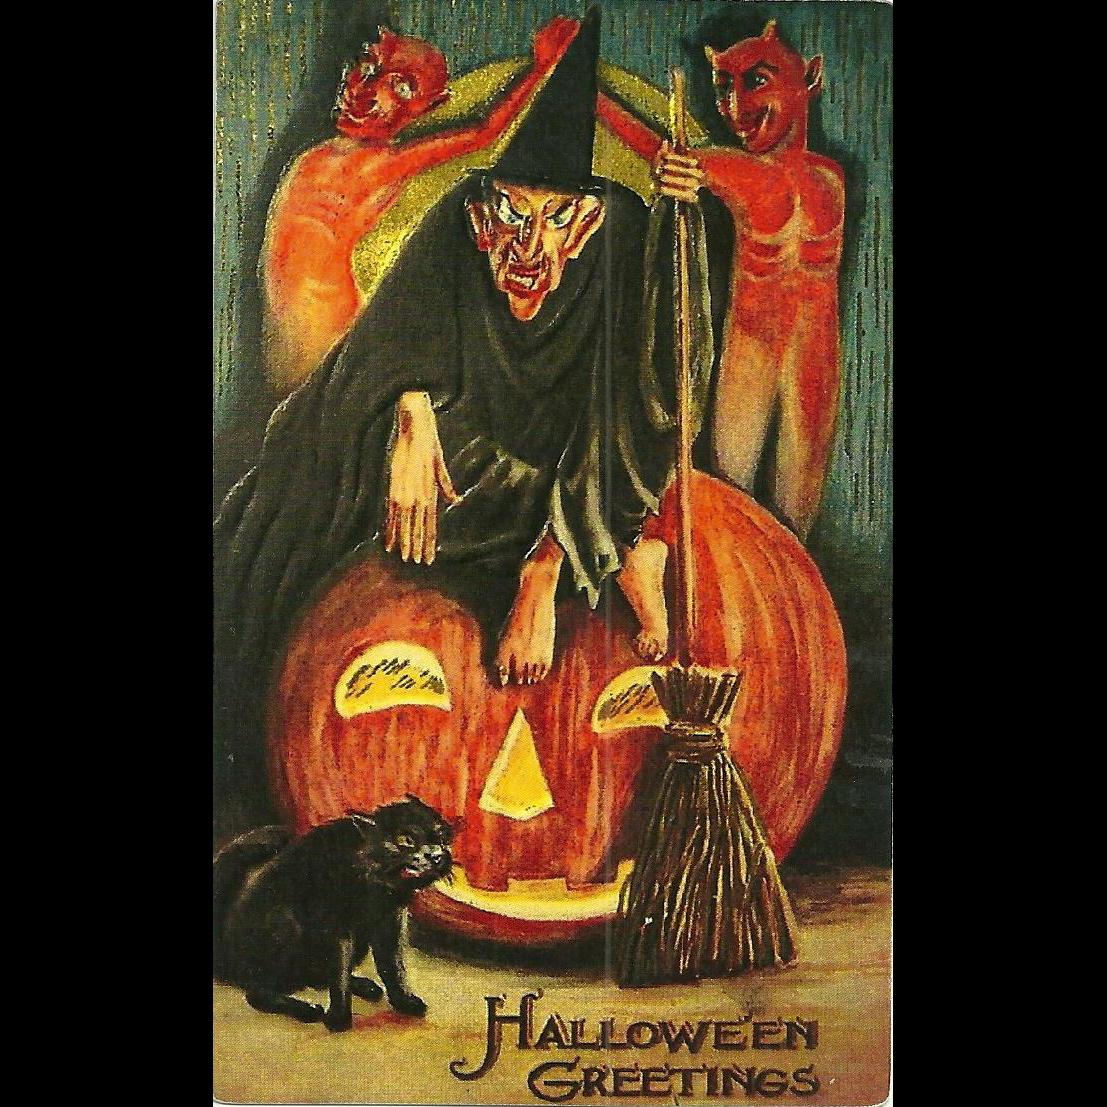 Halloween Greetings  Witch Broom  Devils Black Cat Pumpkin Phostint Postcard